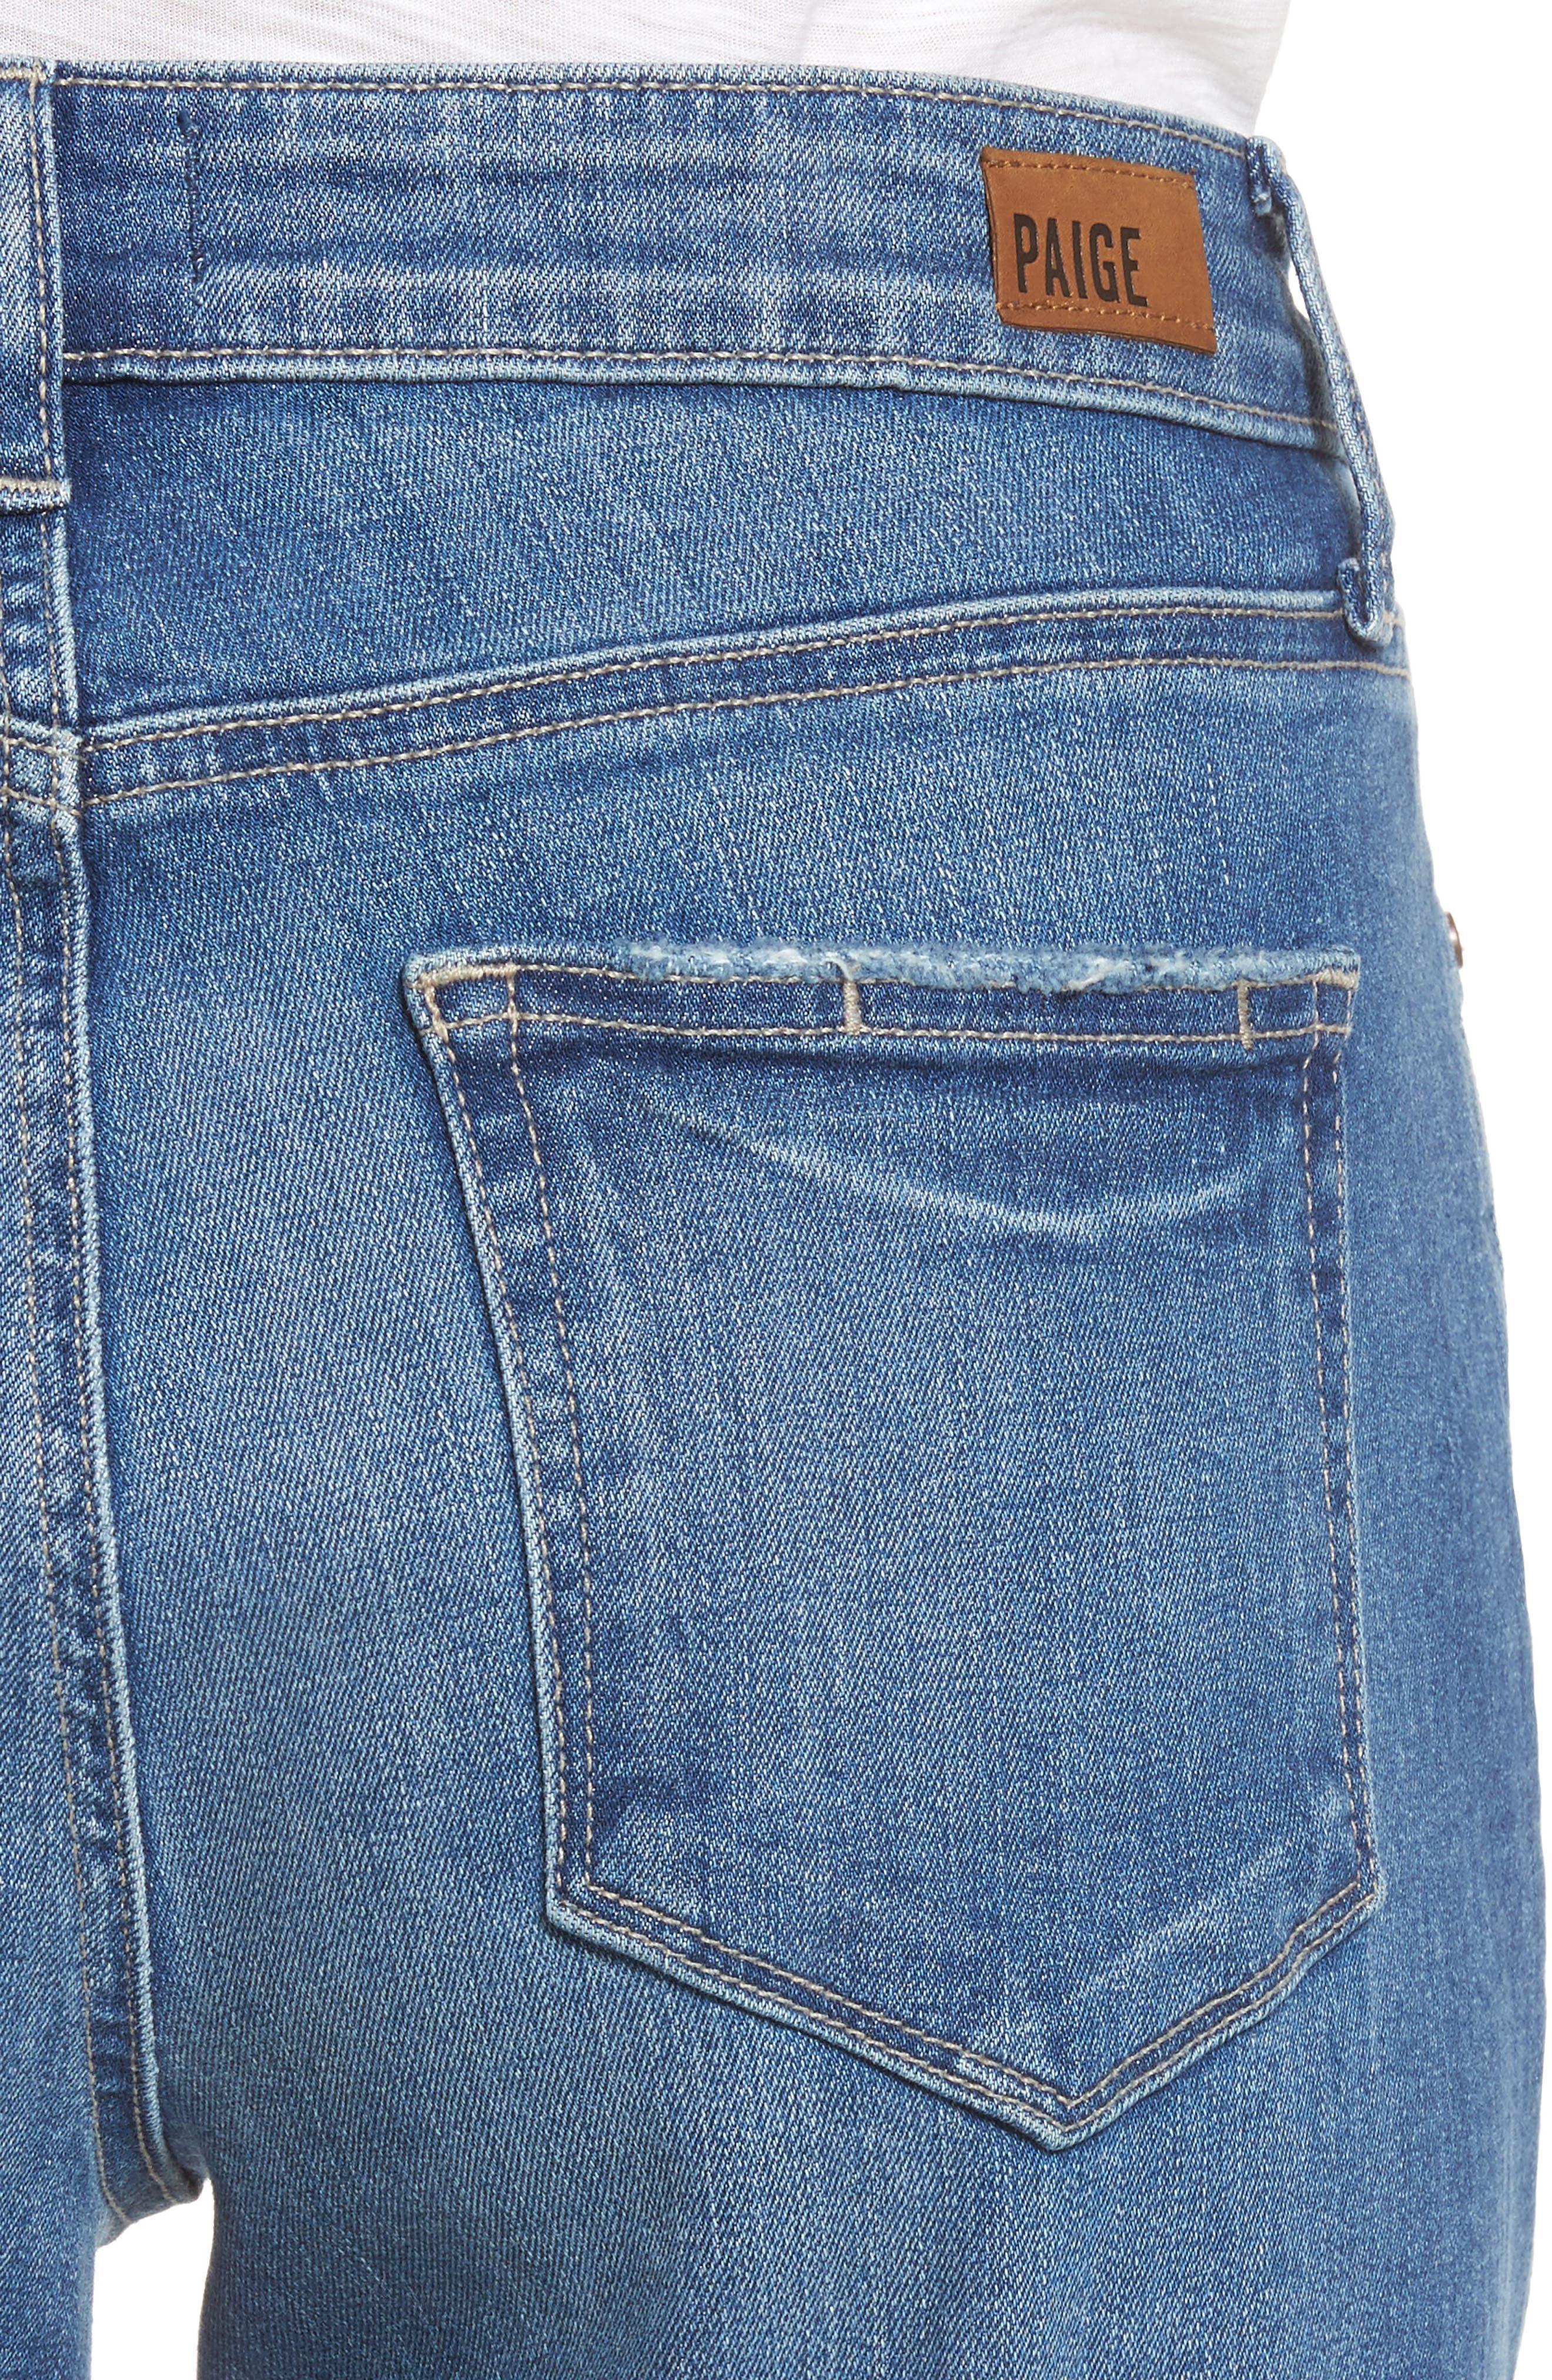 Jimmy Jimmy High Waist Crop Boyfriend Jeans,                             Alternate thumbnail 4, color,                             Ludlow Destructed